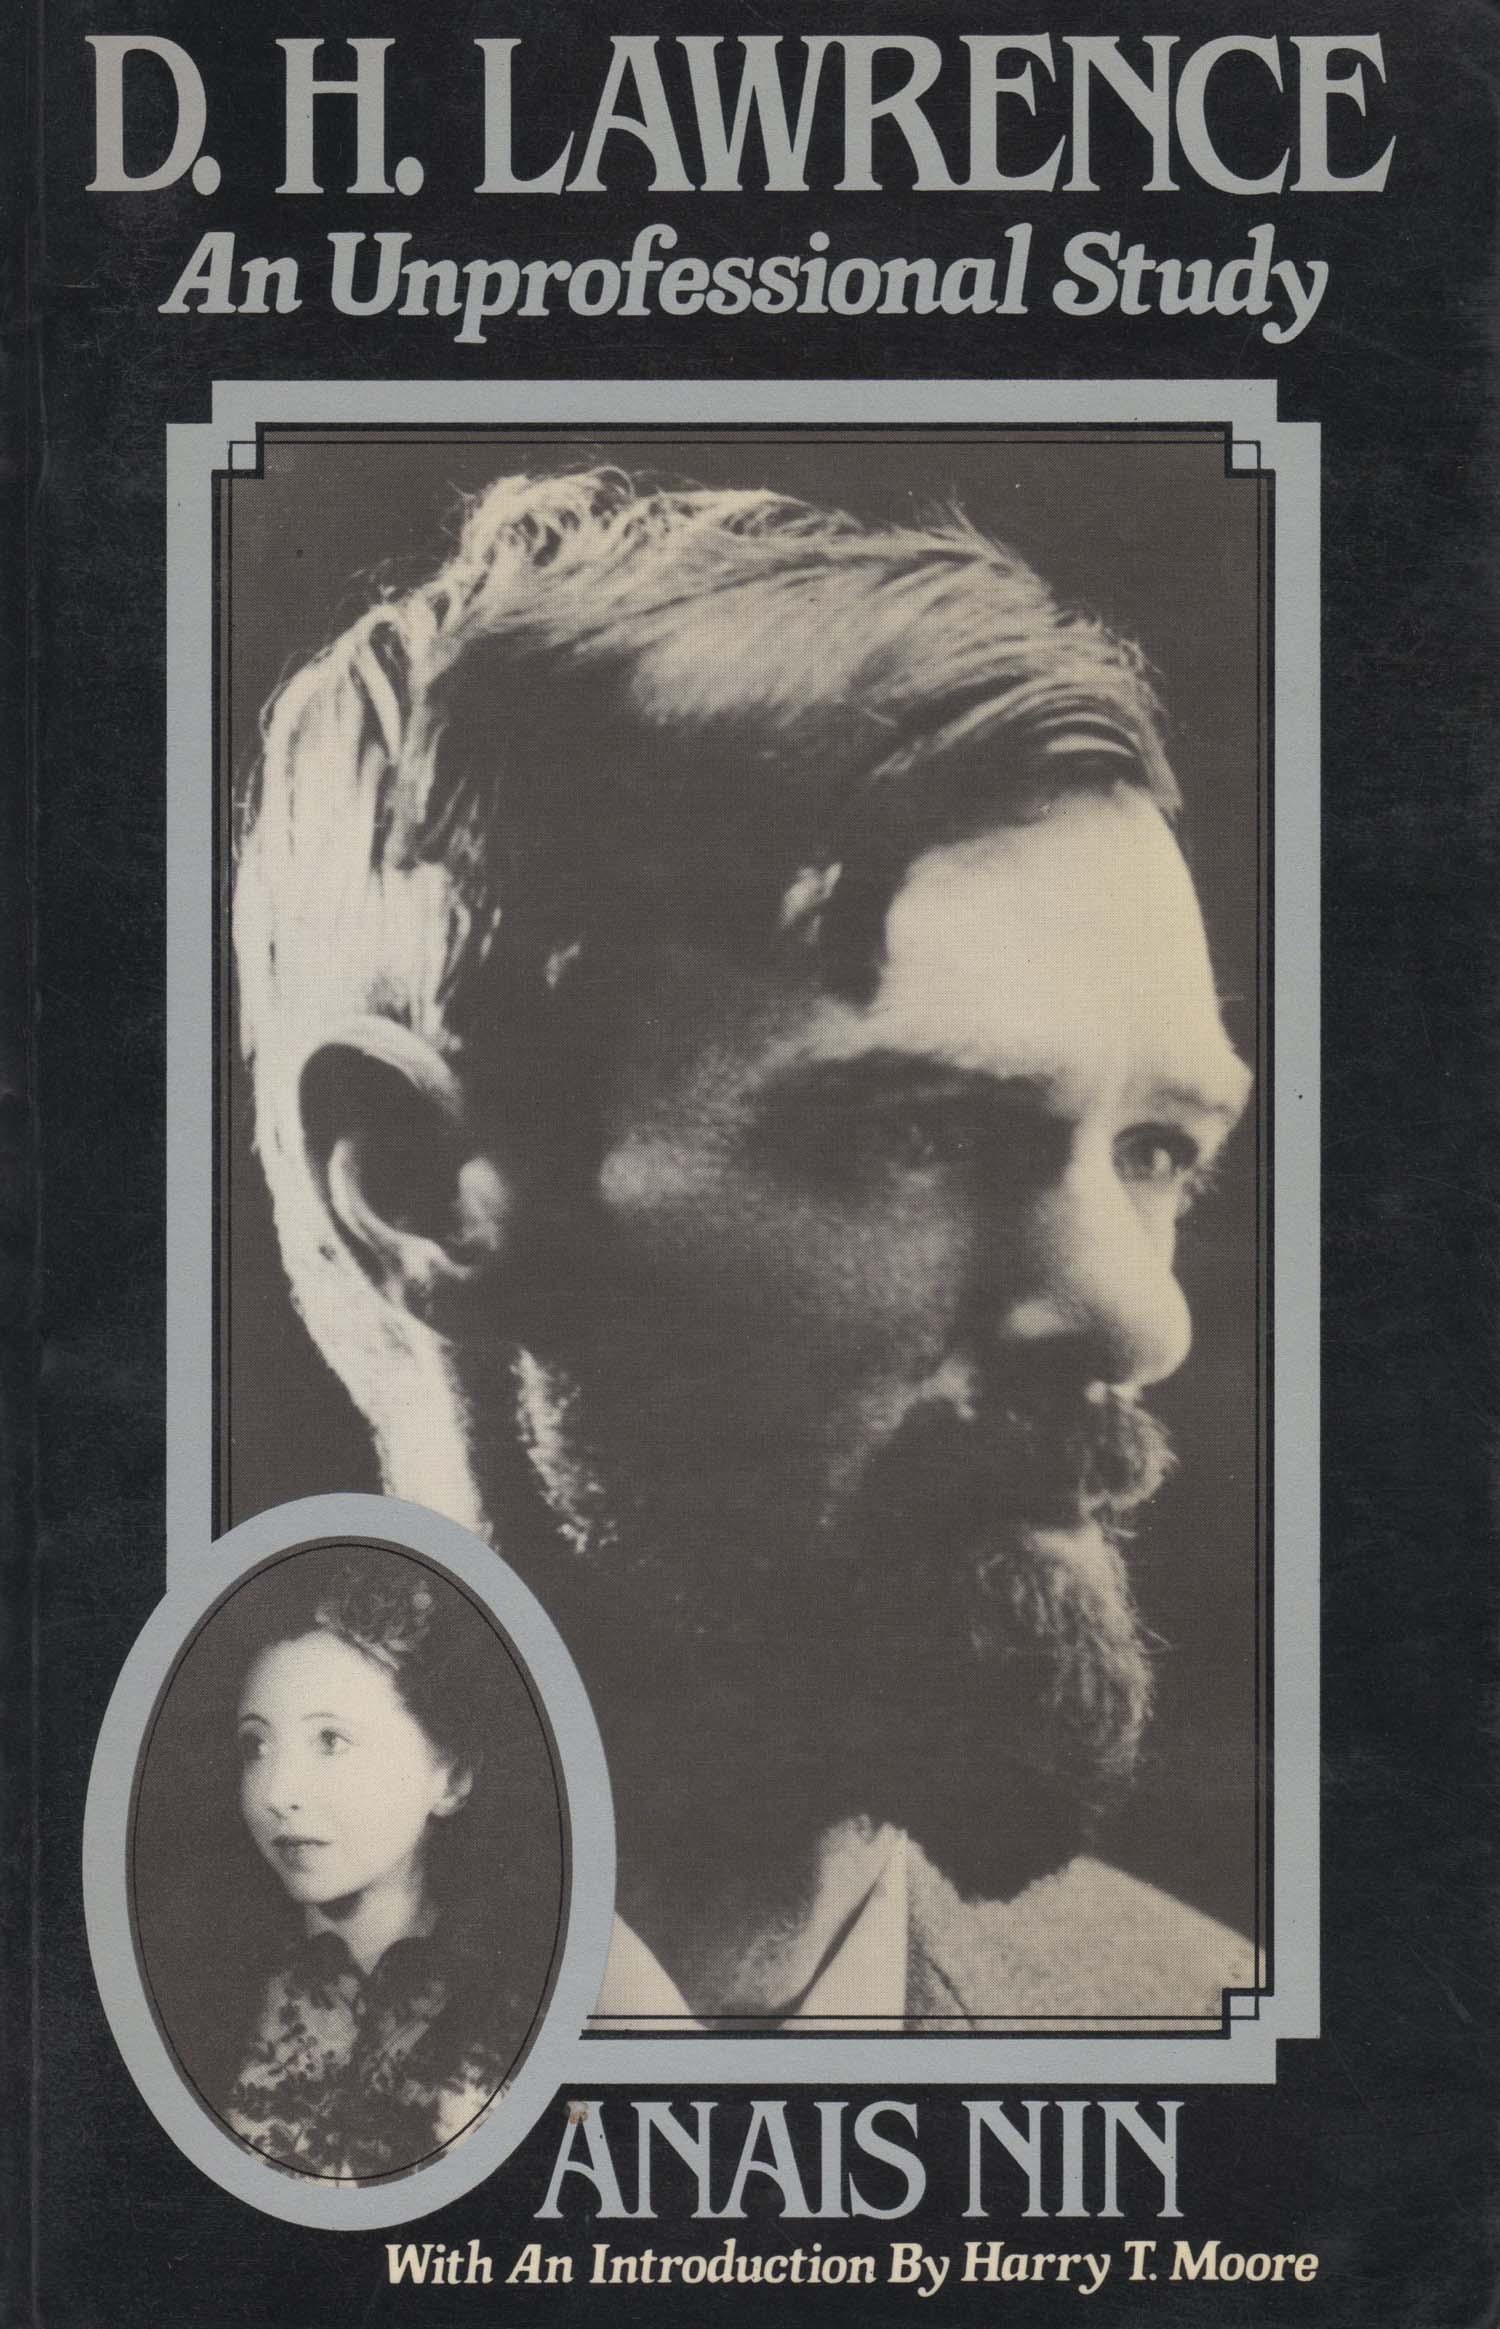 D.H. Lawrence, An Unprofessional Study